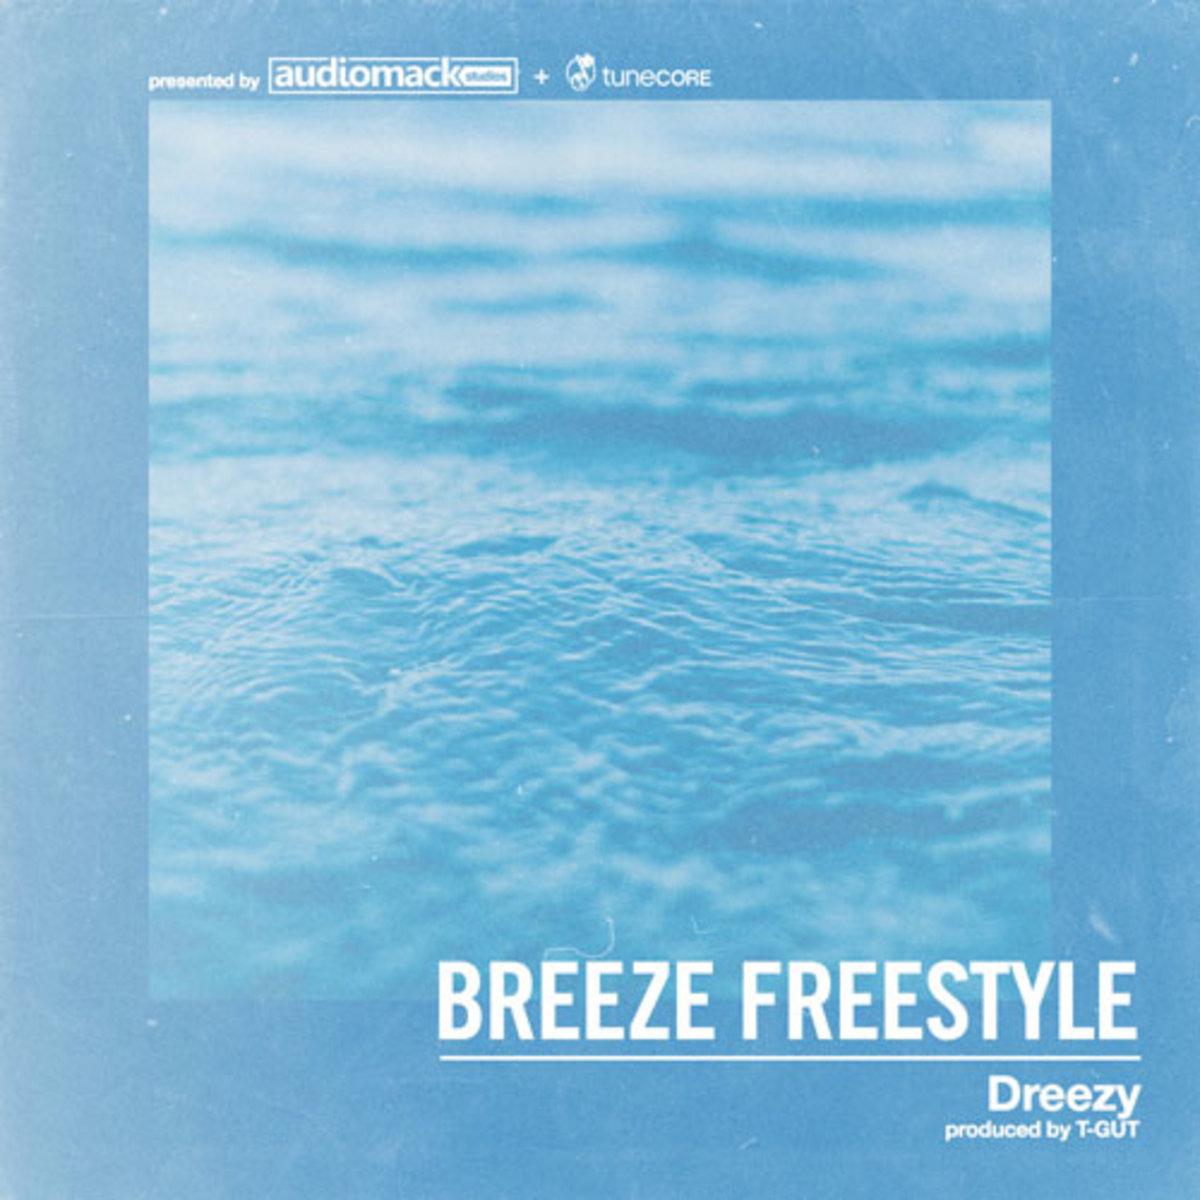 dreezy-breeze-freestyle-art.jpg